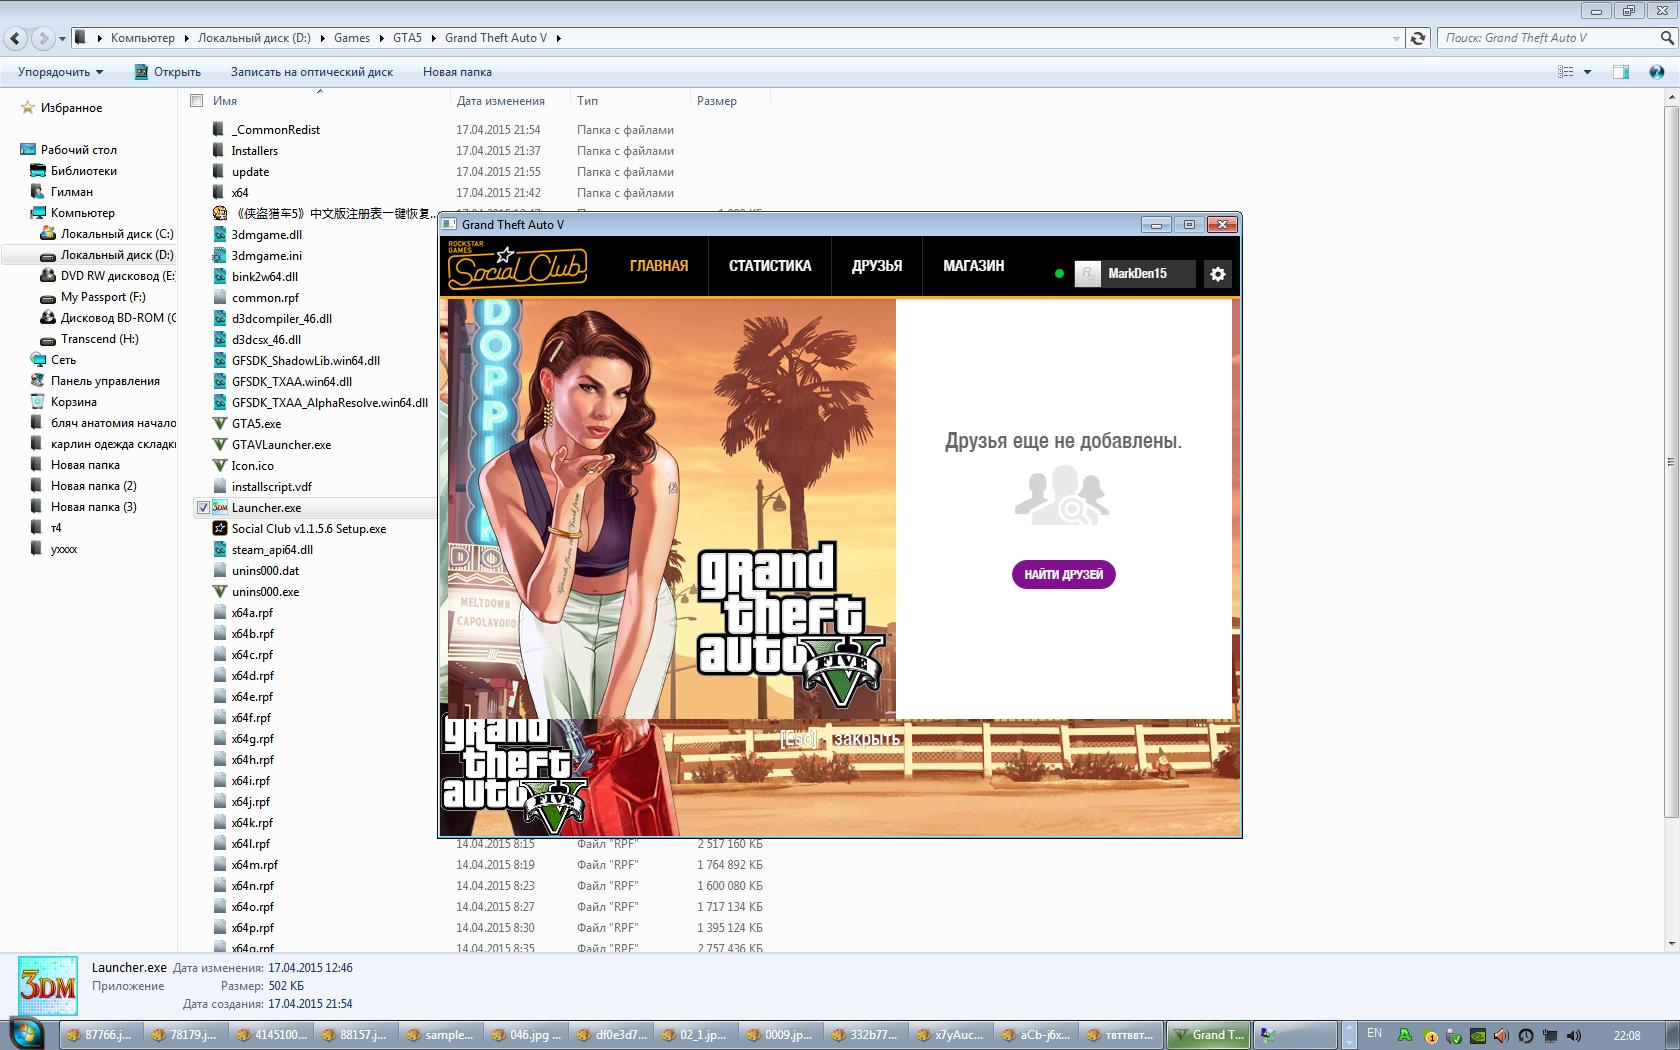 Gta 5 pc torrent download crack pack keygen razor games